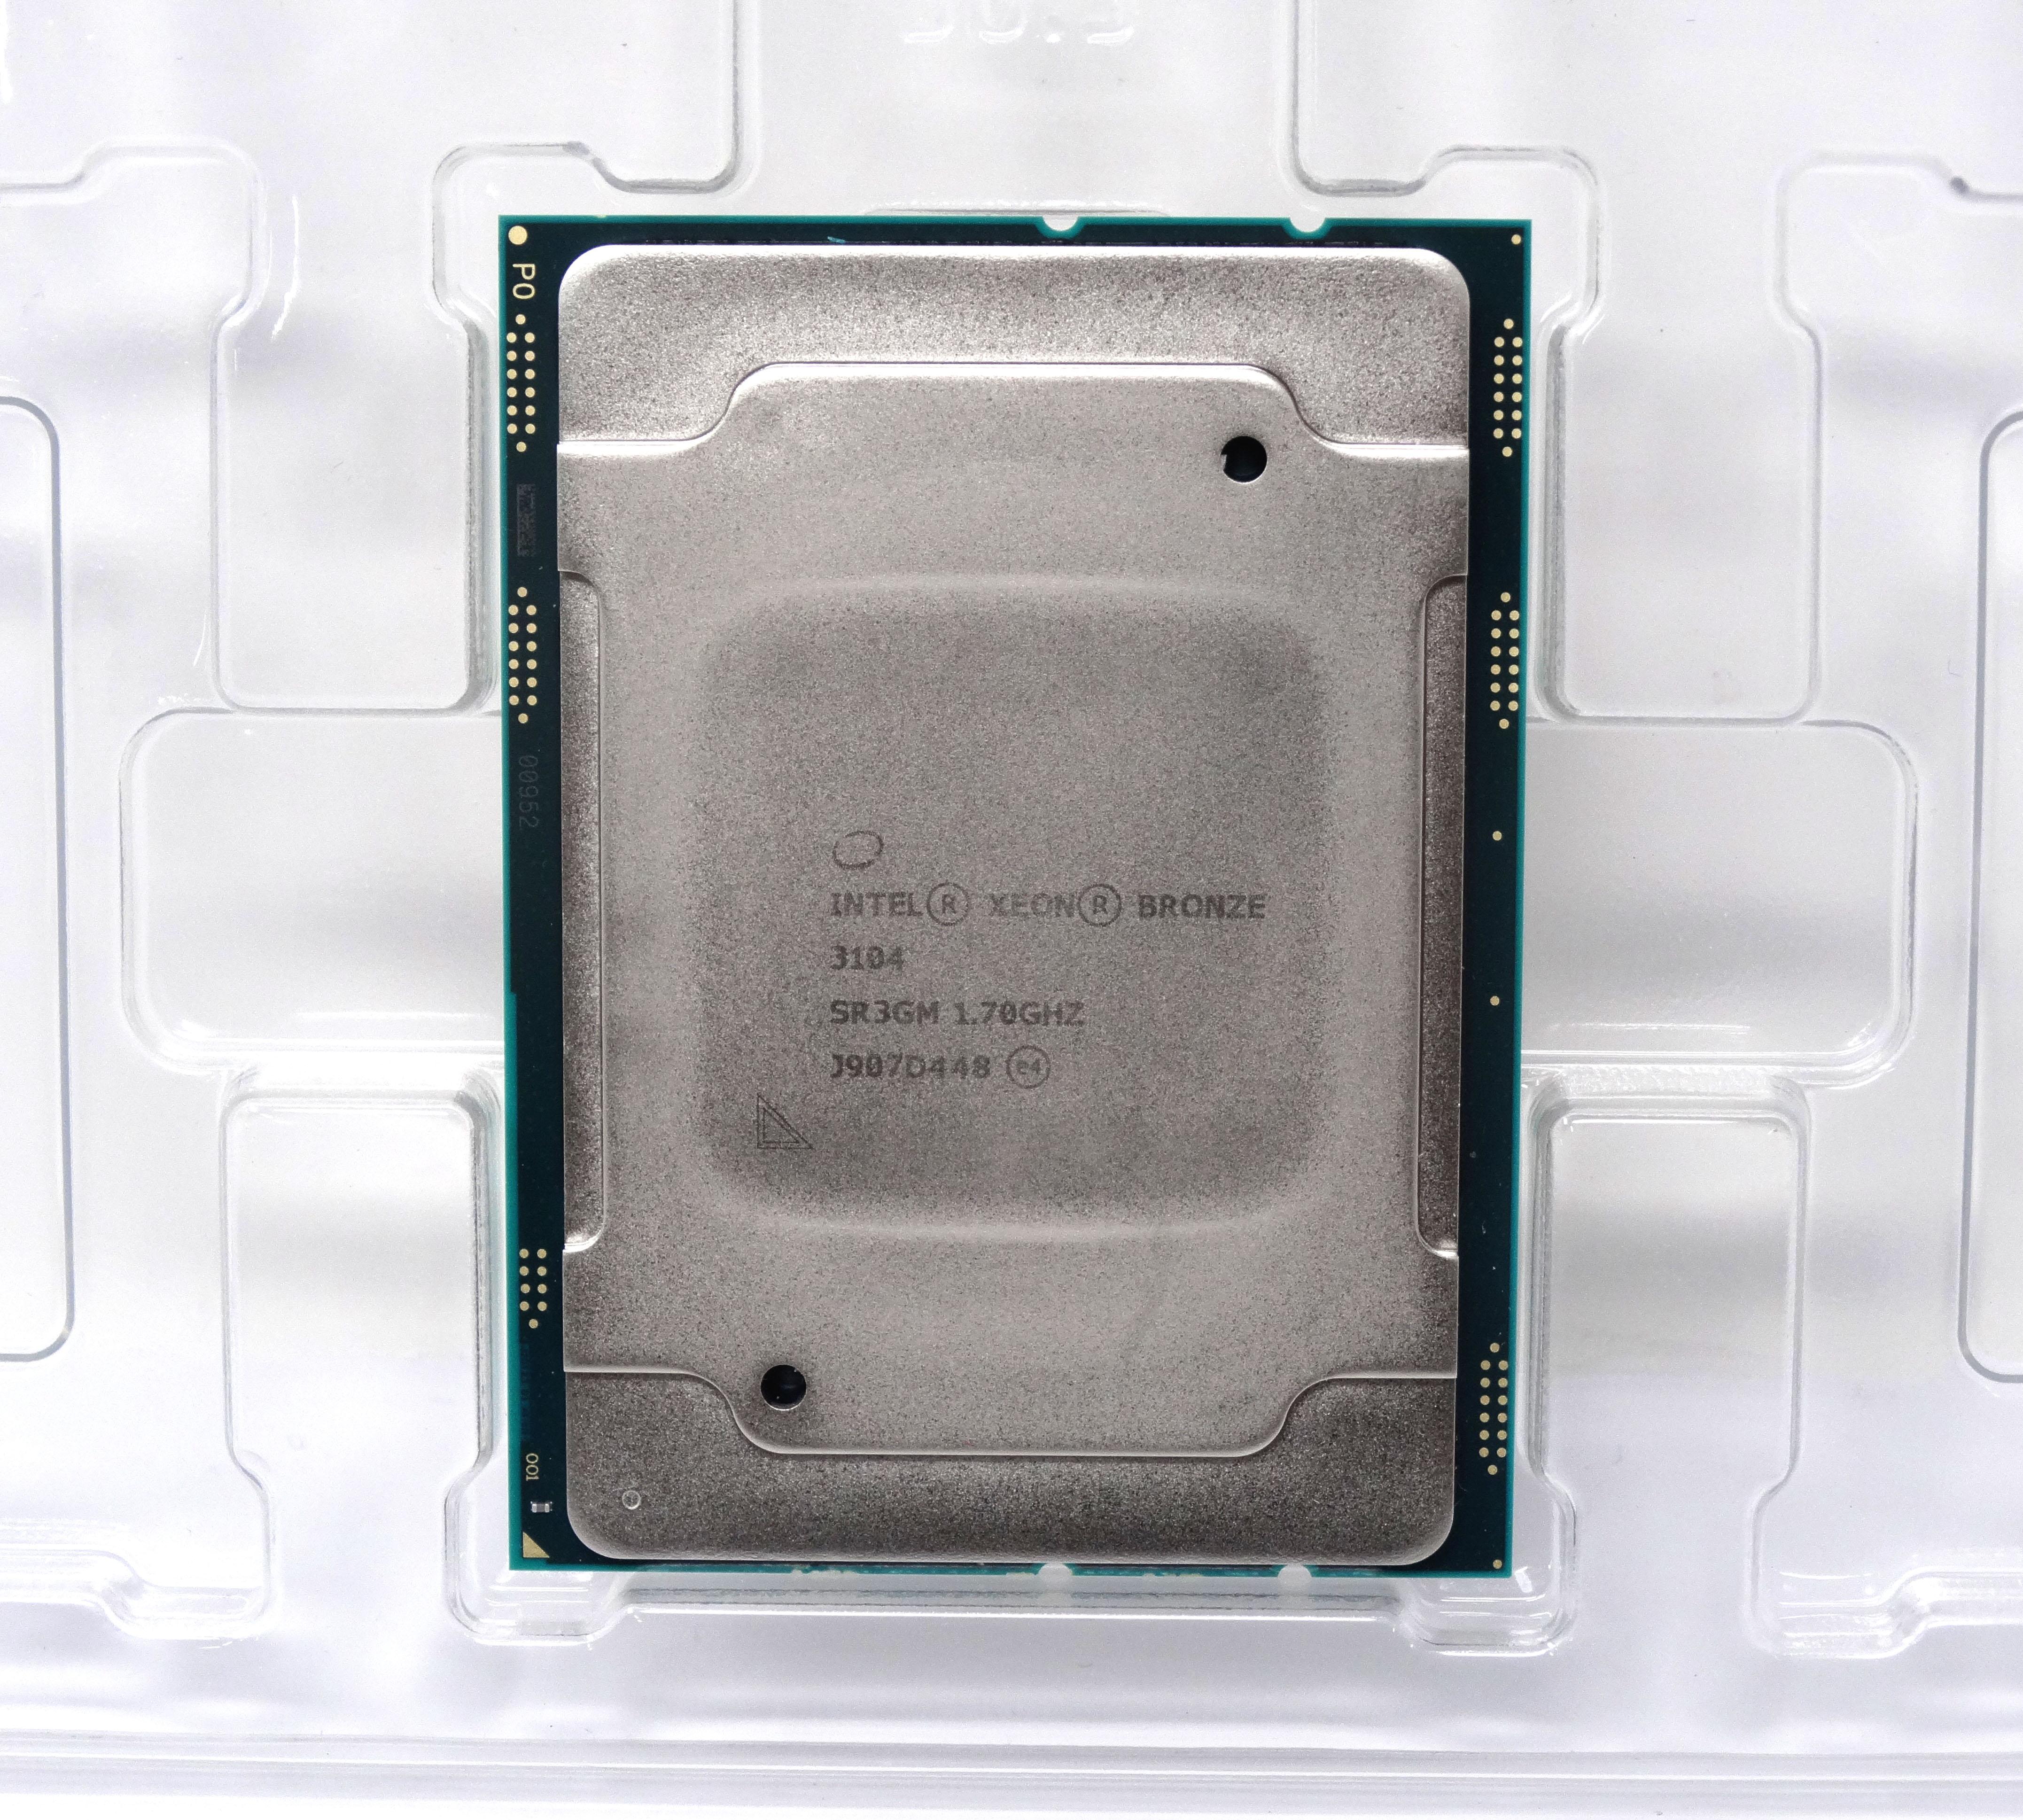 - CPU Only Intel Xeon Bronze 3104 6 Cores 1.7GHz 8.25MB CPU LGA 3647 Processor (872006-B21 - CPU ONLY)